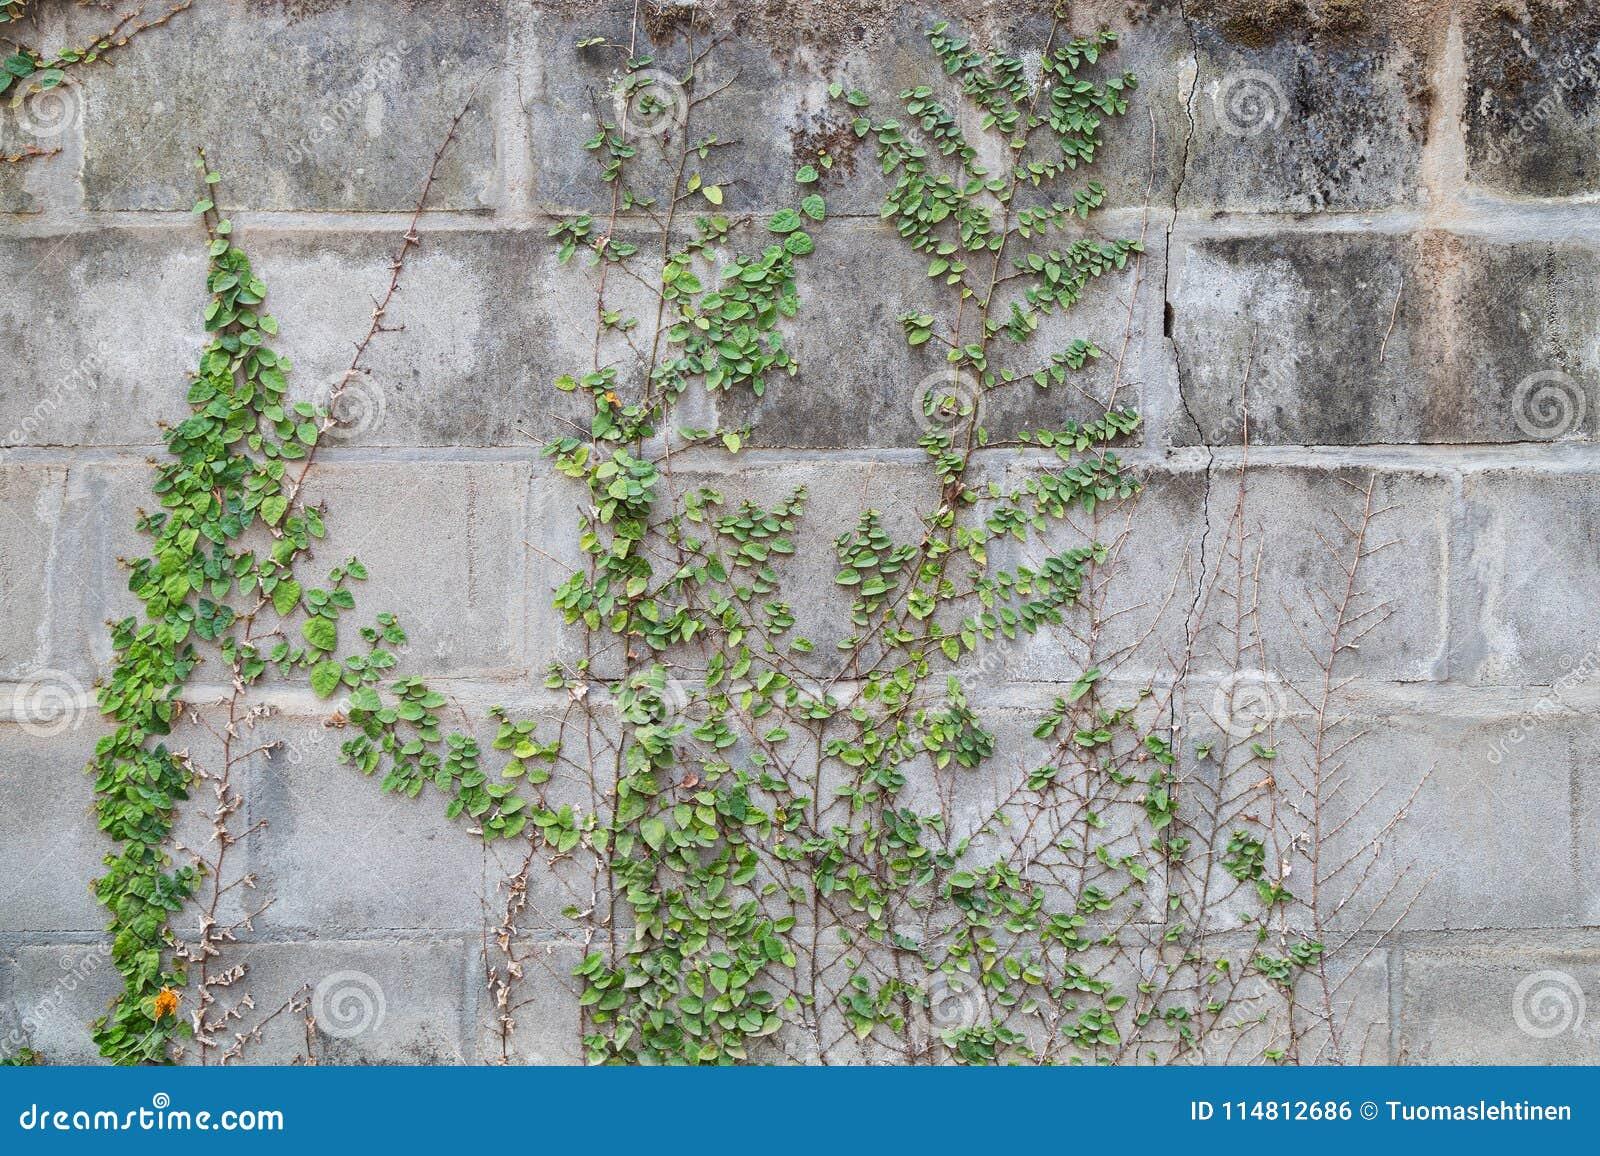 Бетон лоза купить бетон в шелехова цена